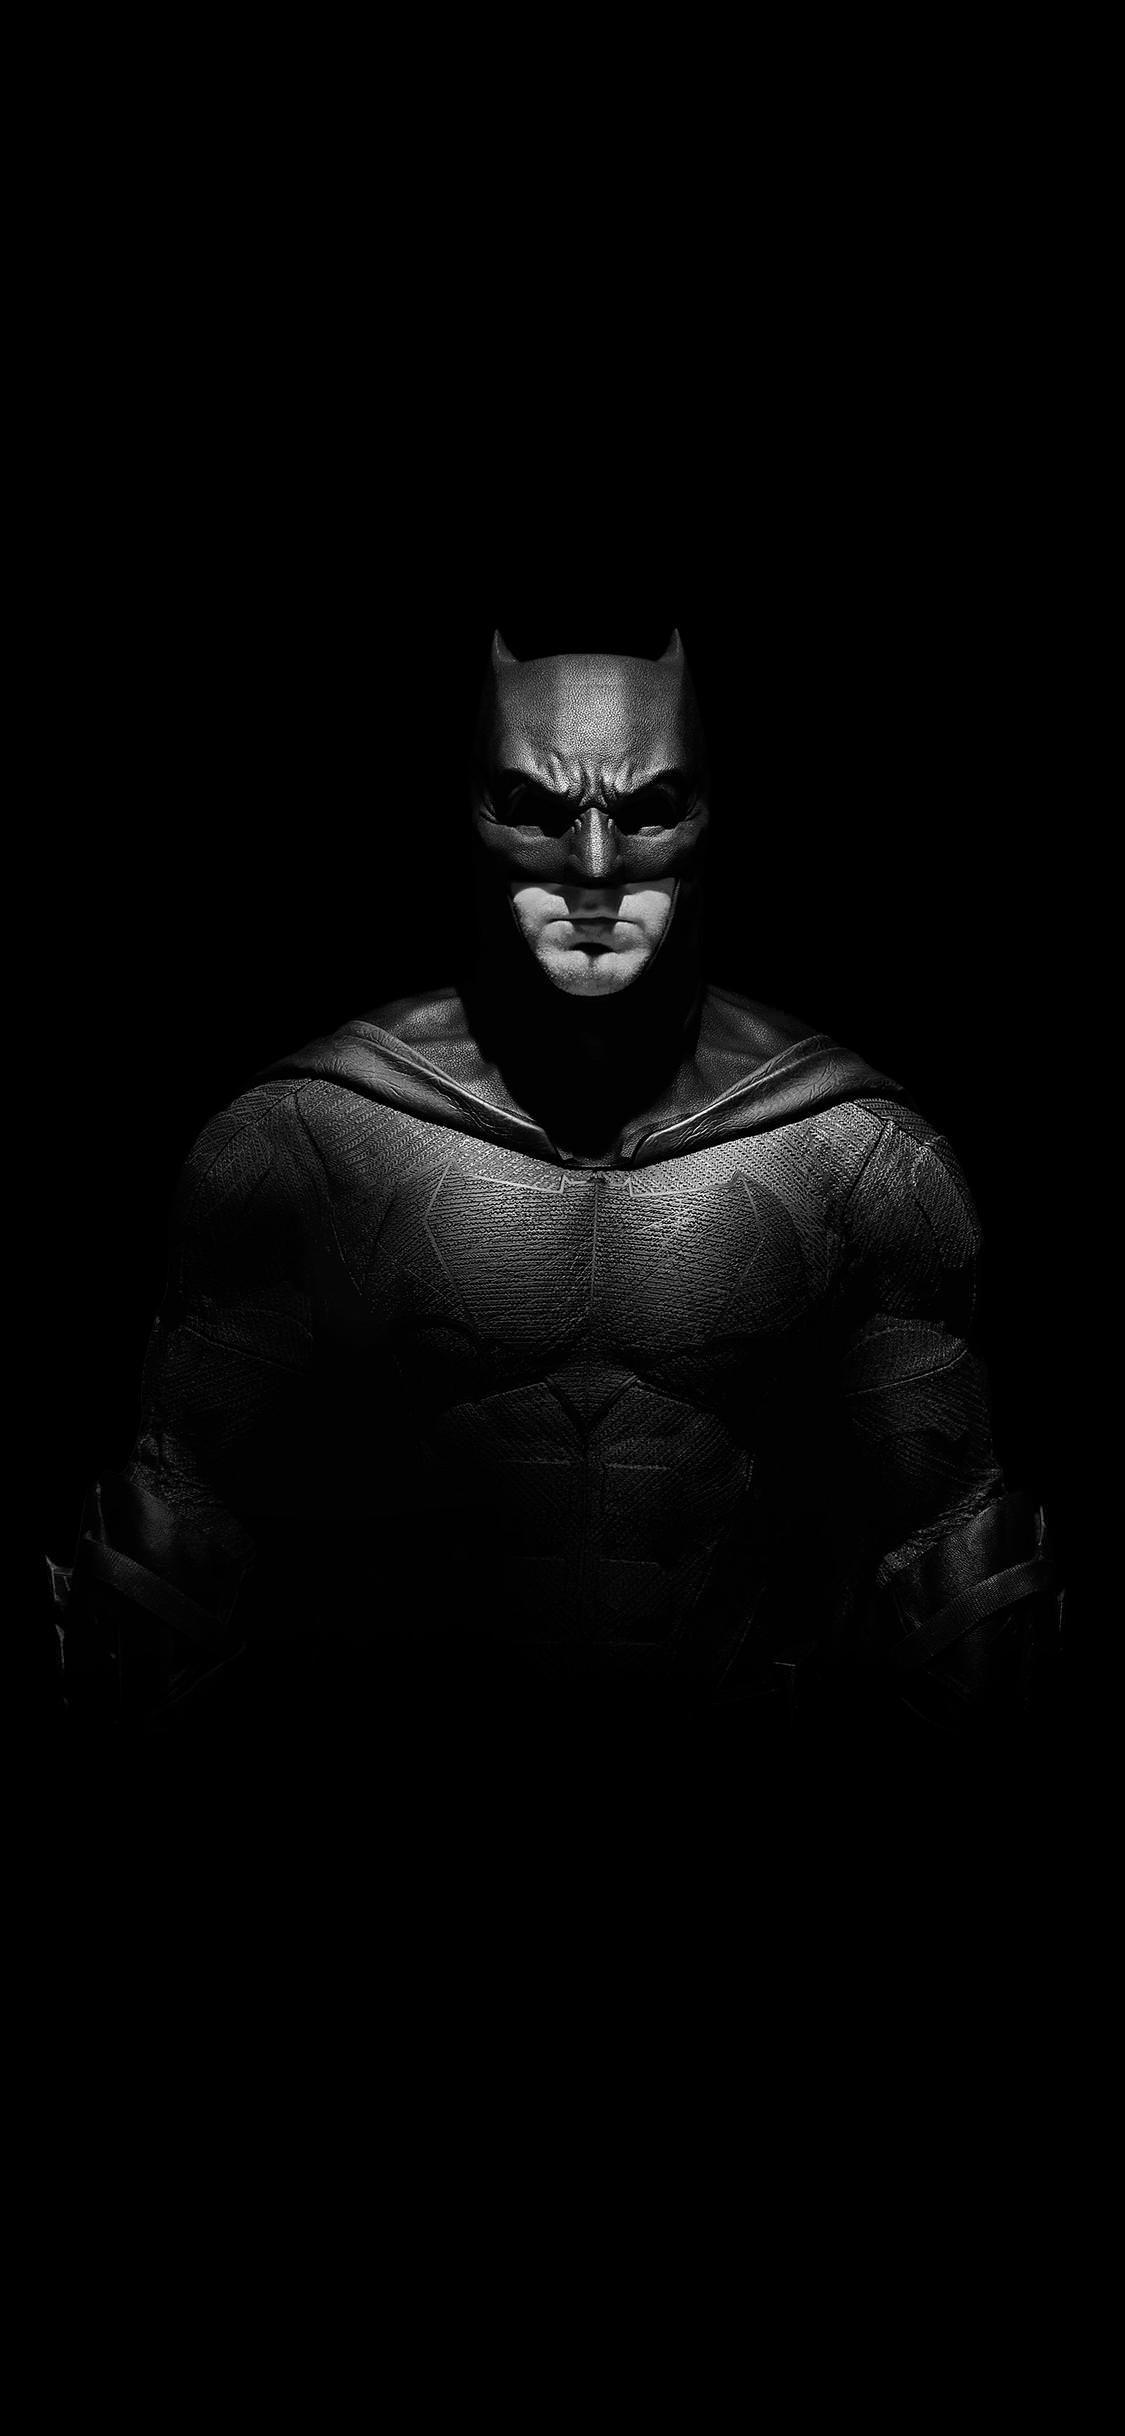 I Do Not Own This Image Batman Wallpaper Iphone Batman Wallpaper Dark Phone Wallpapers